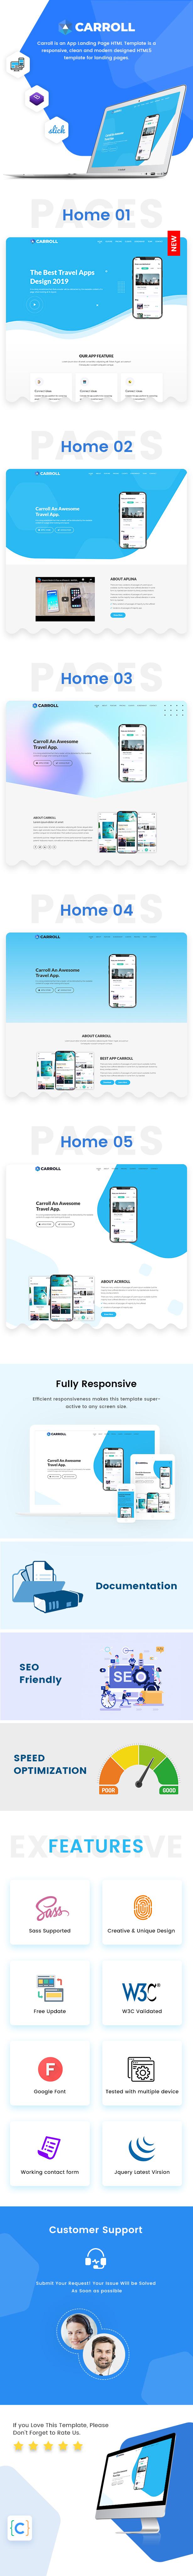 App Landing Page Template